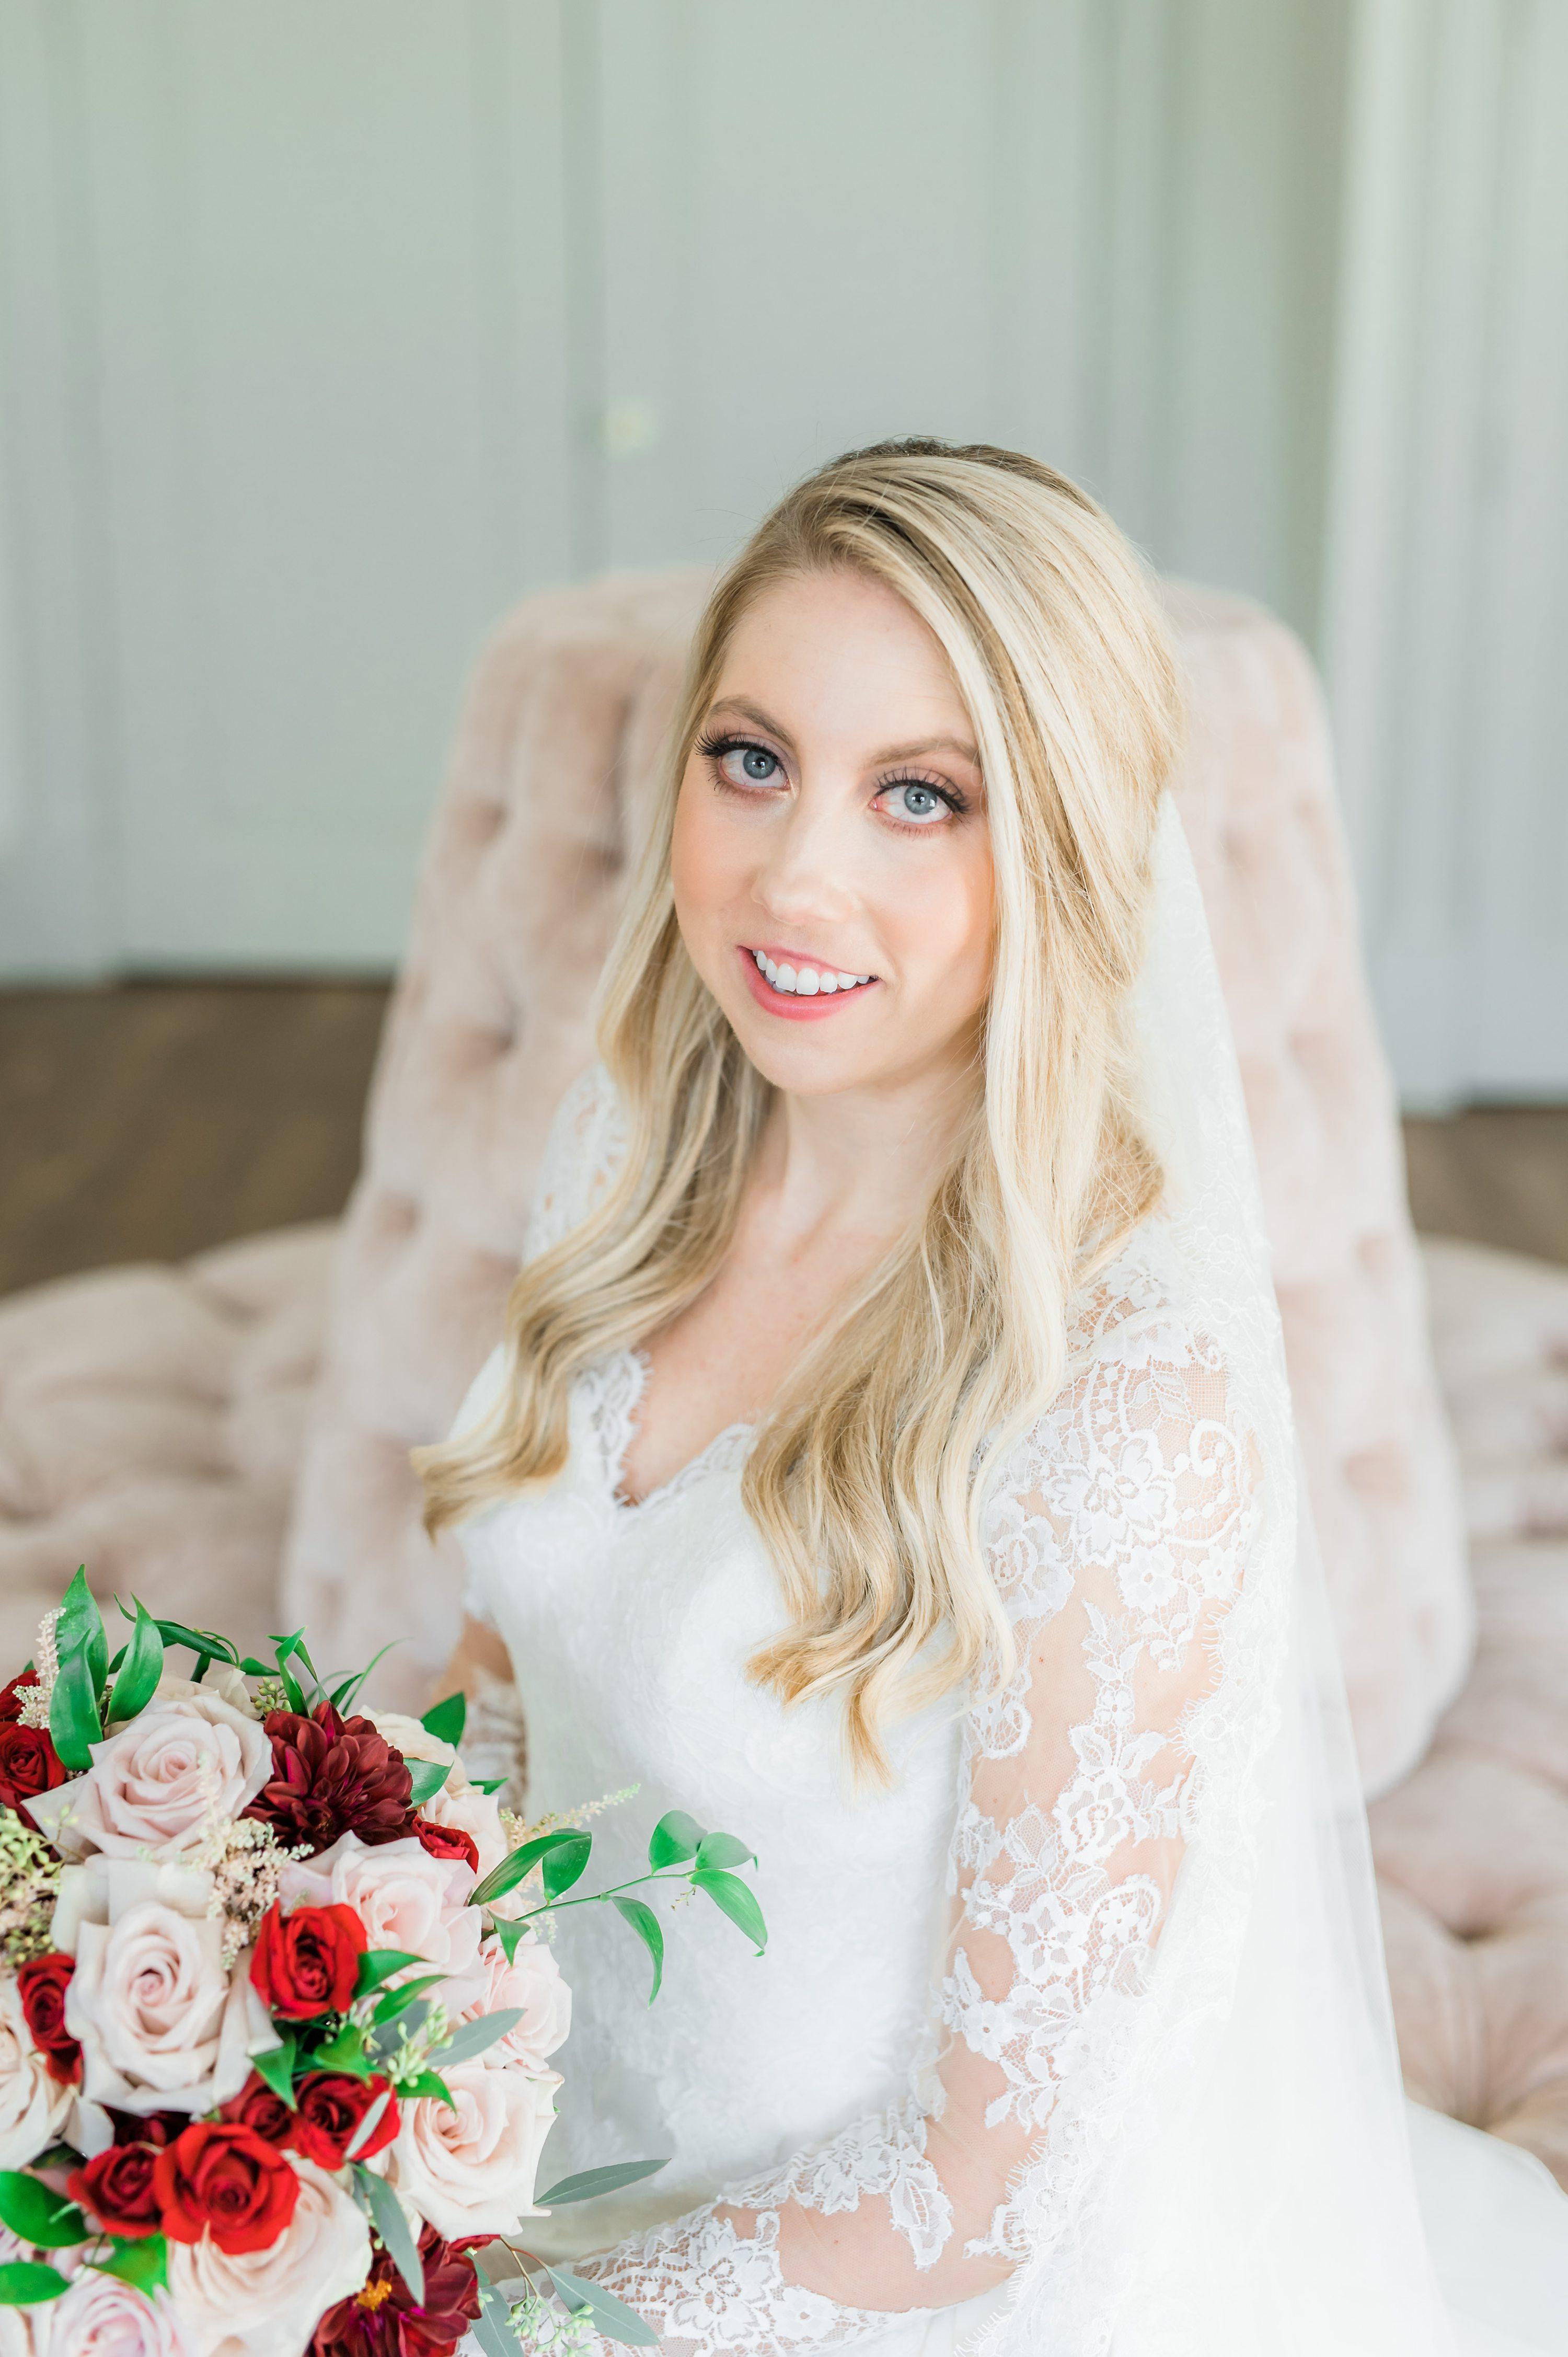 Houston Bridal,Husband & Wife Team